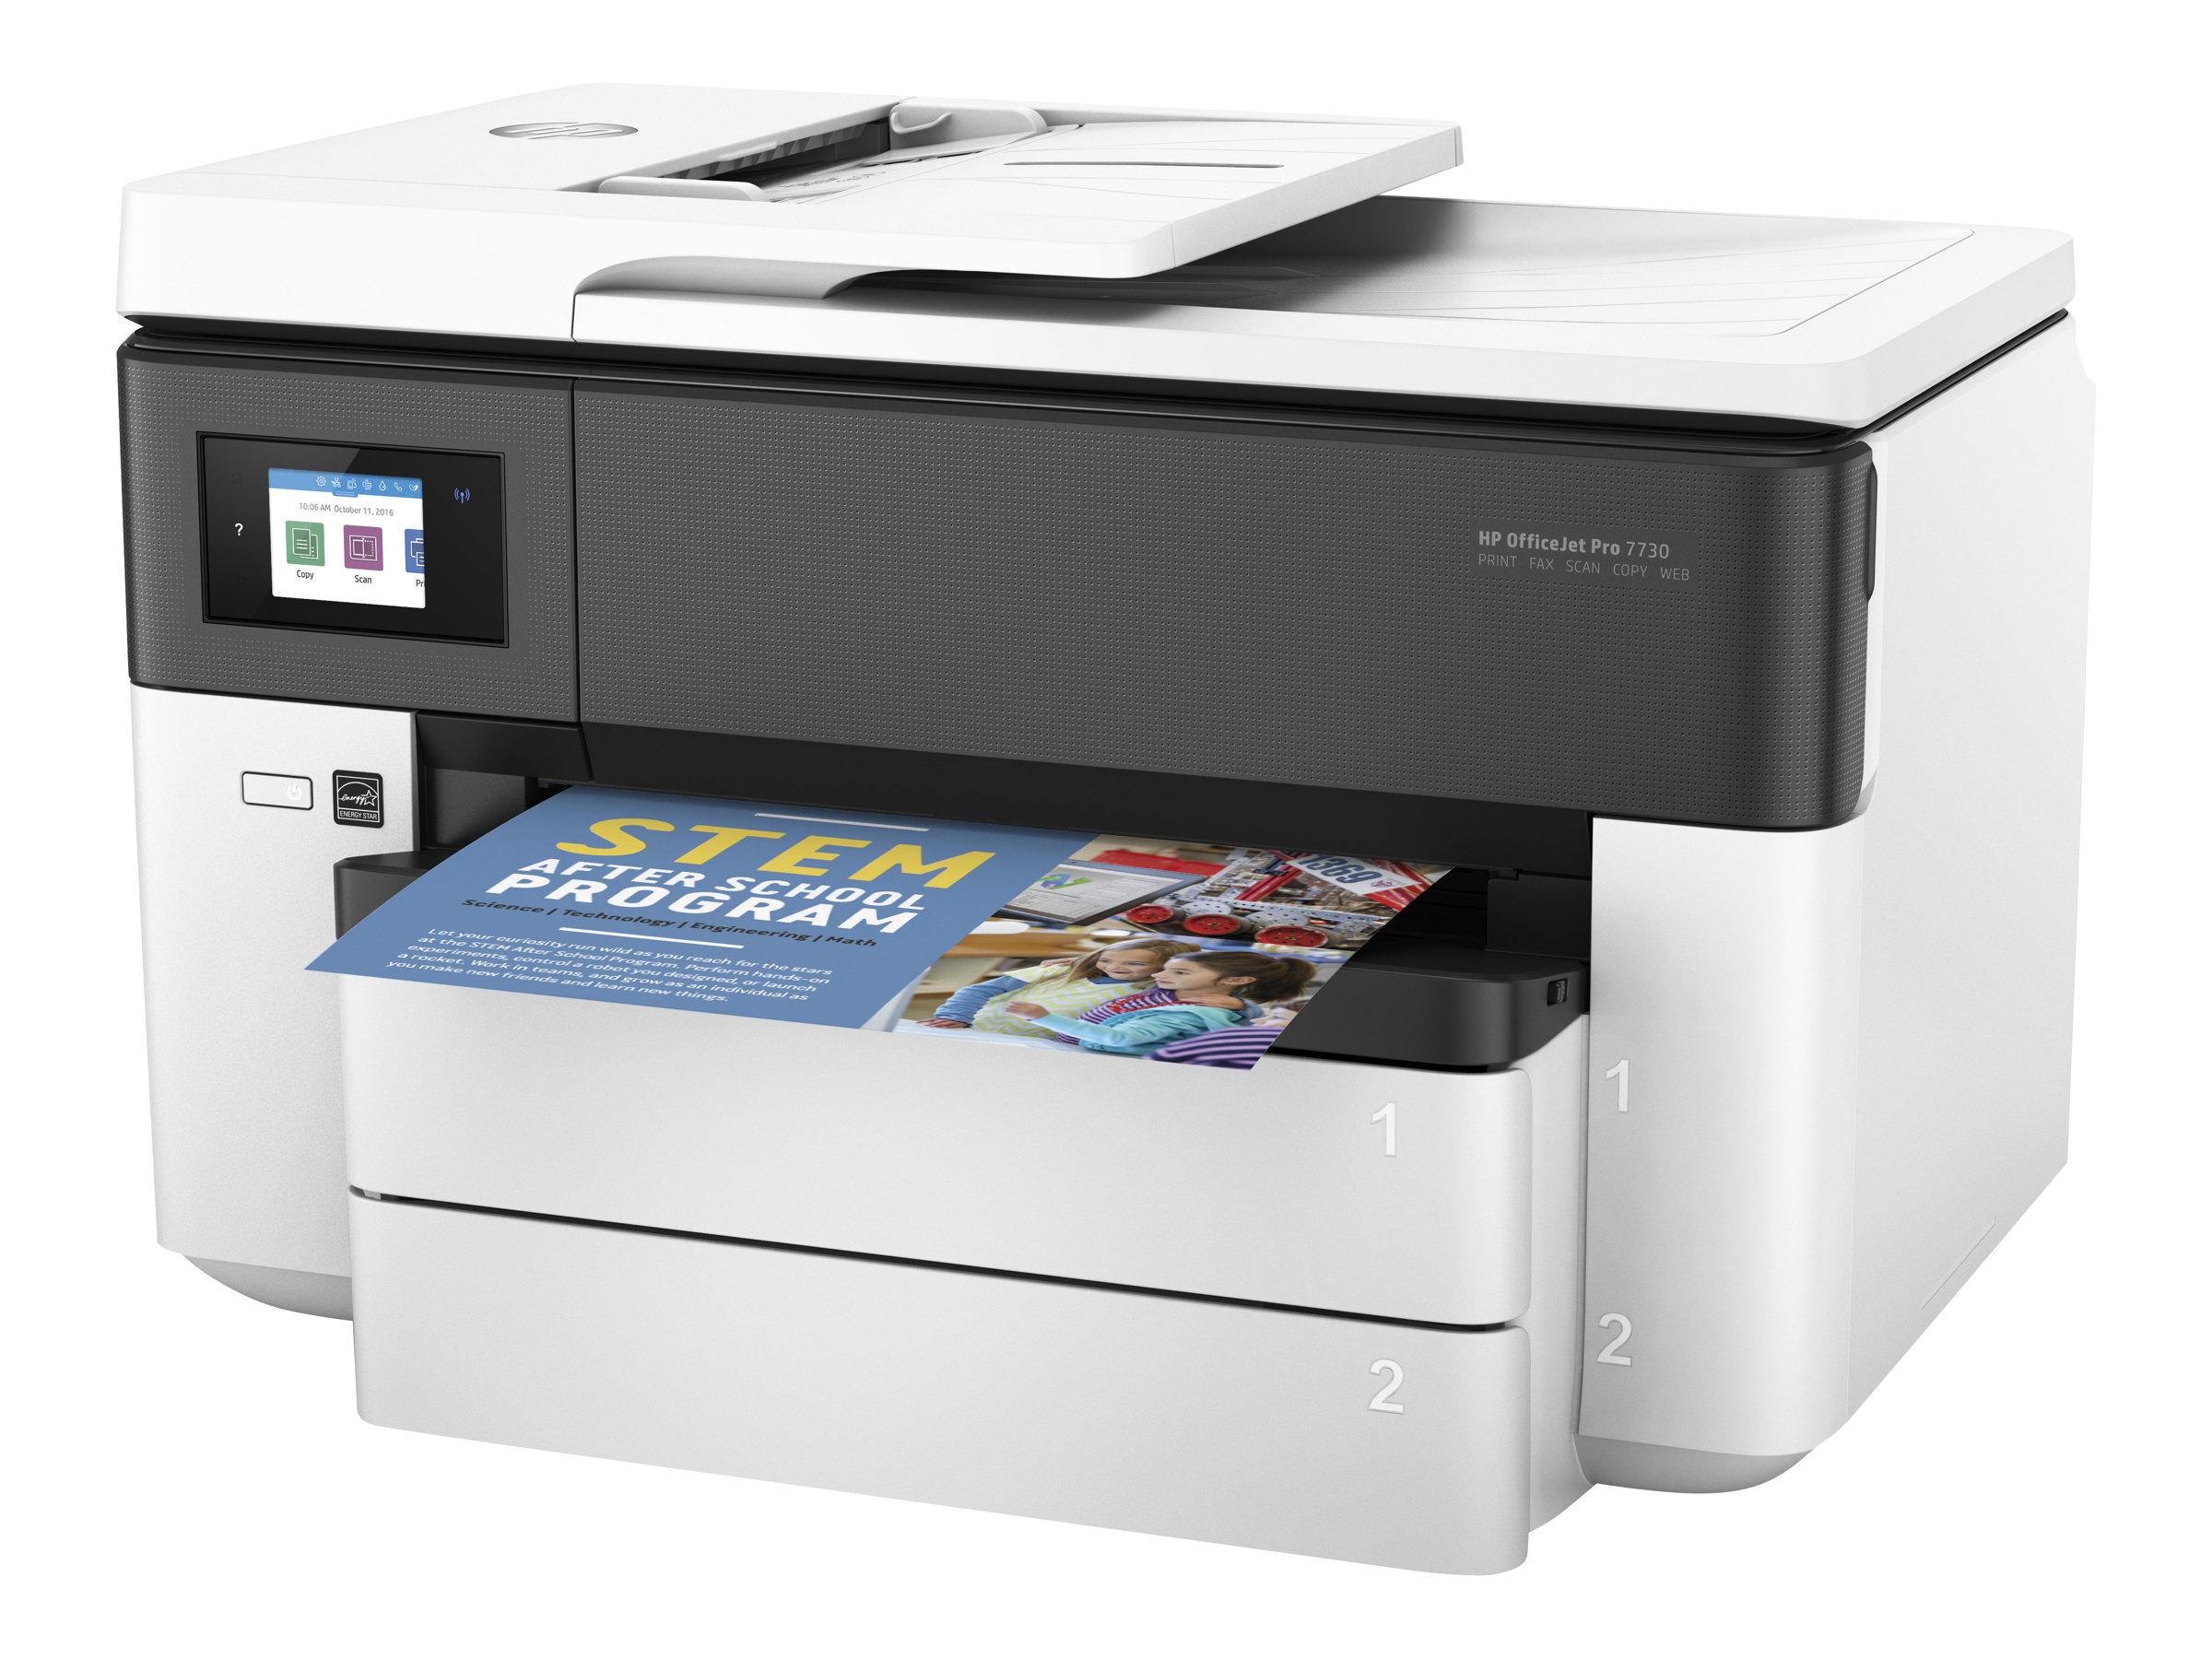 HP Officejet Pro 7730 Wide Format All-in-One - Multifunktionsdrucker - Farbe - Tintenstrahl - 216 x 356 mm (Original) - A3 (Medi